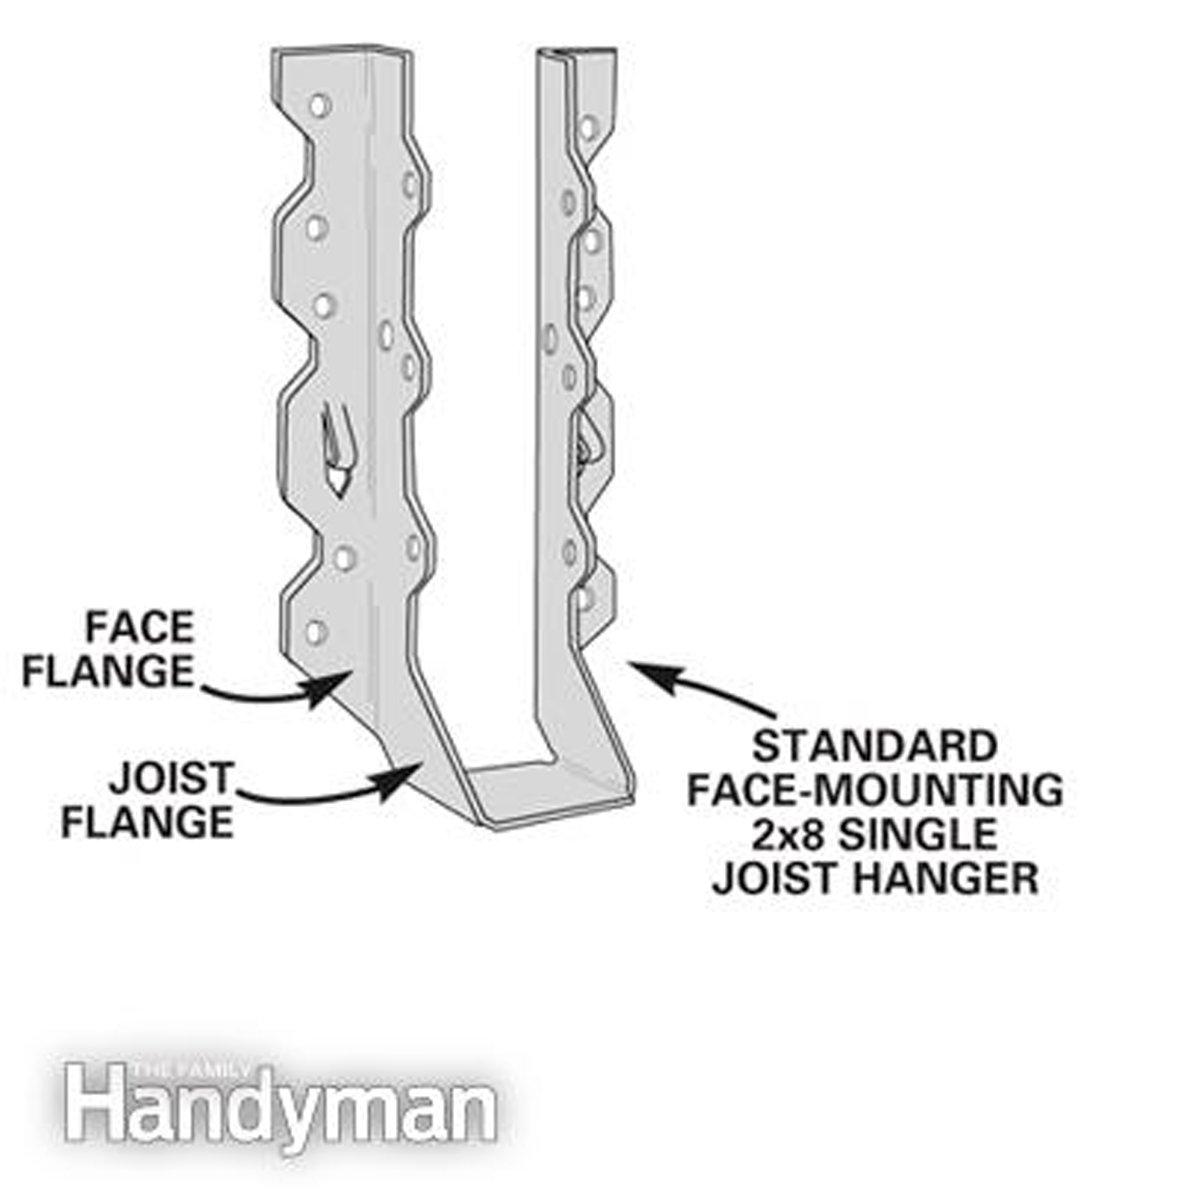 How many nails per joist hanger